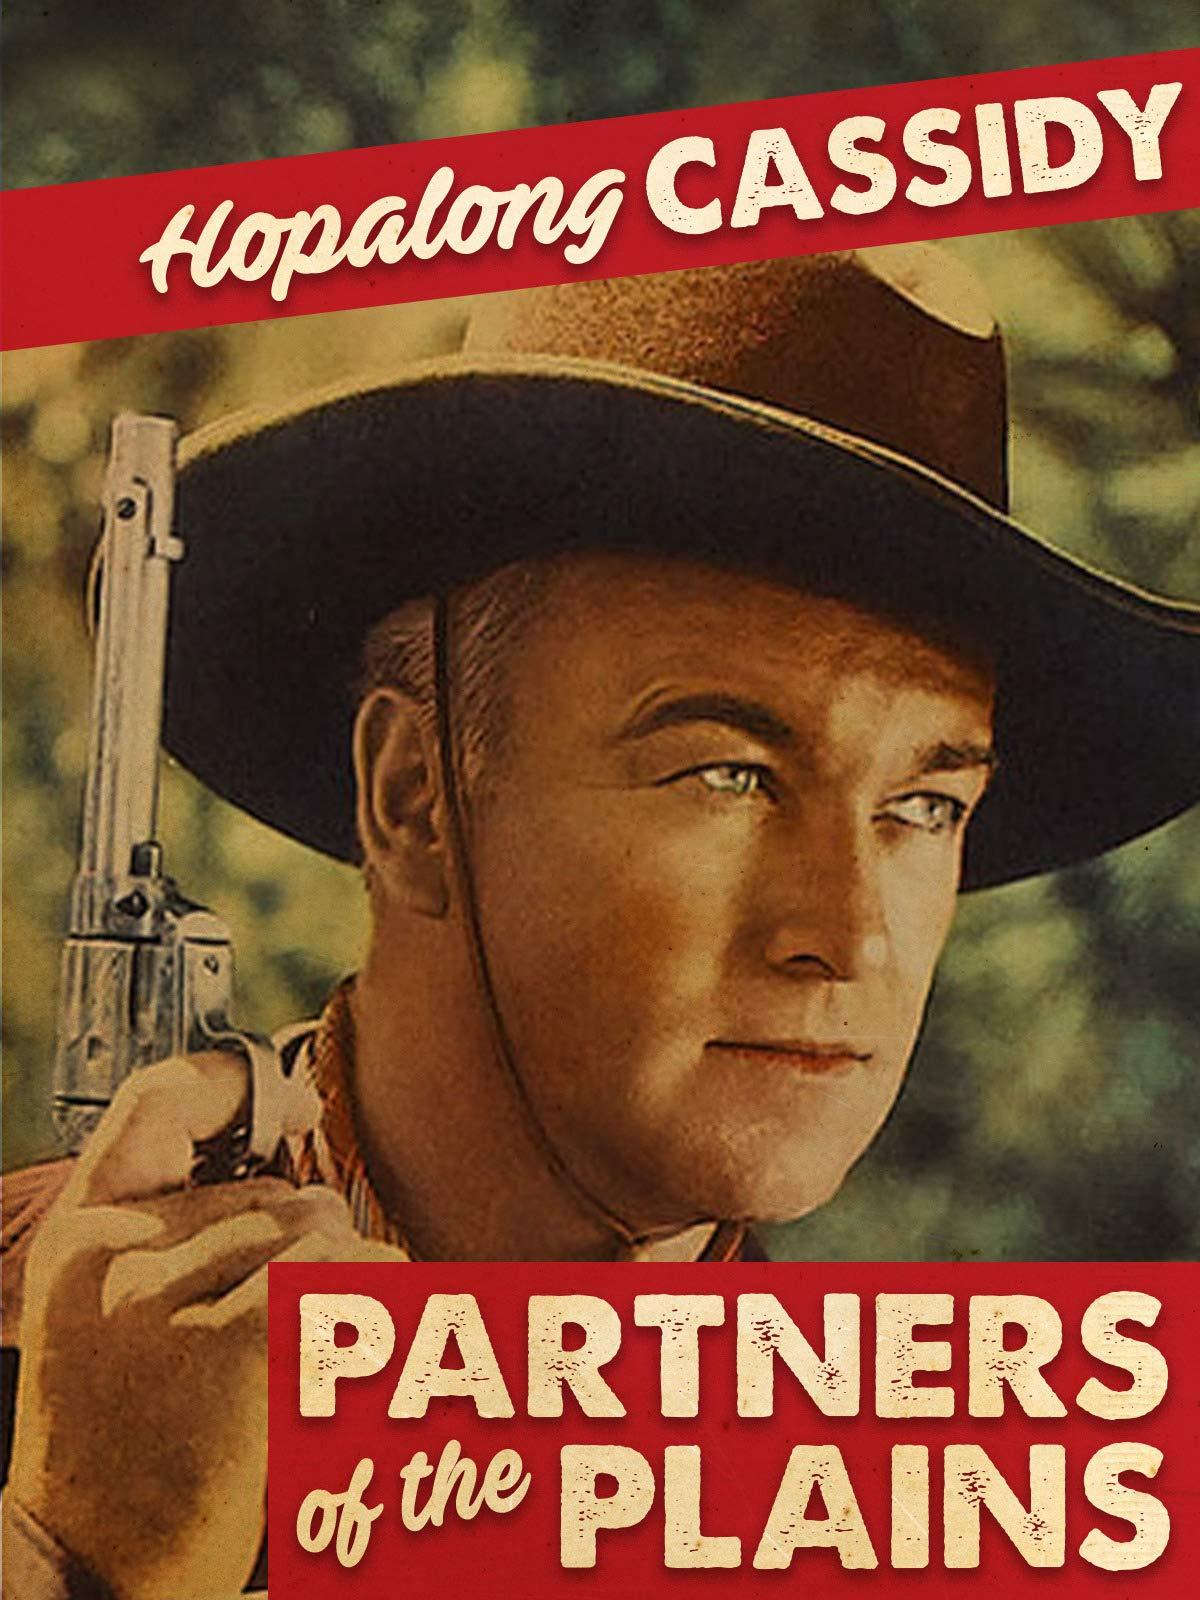 Hopalong Cassidy Partners Of The Plains on Amazon Prime Video UK